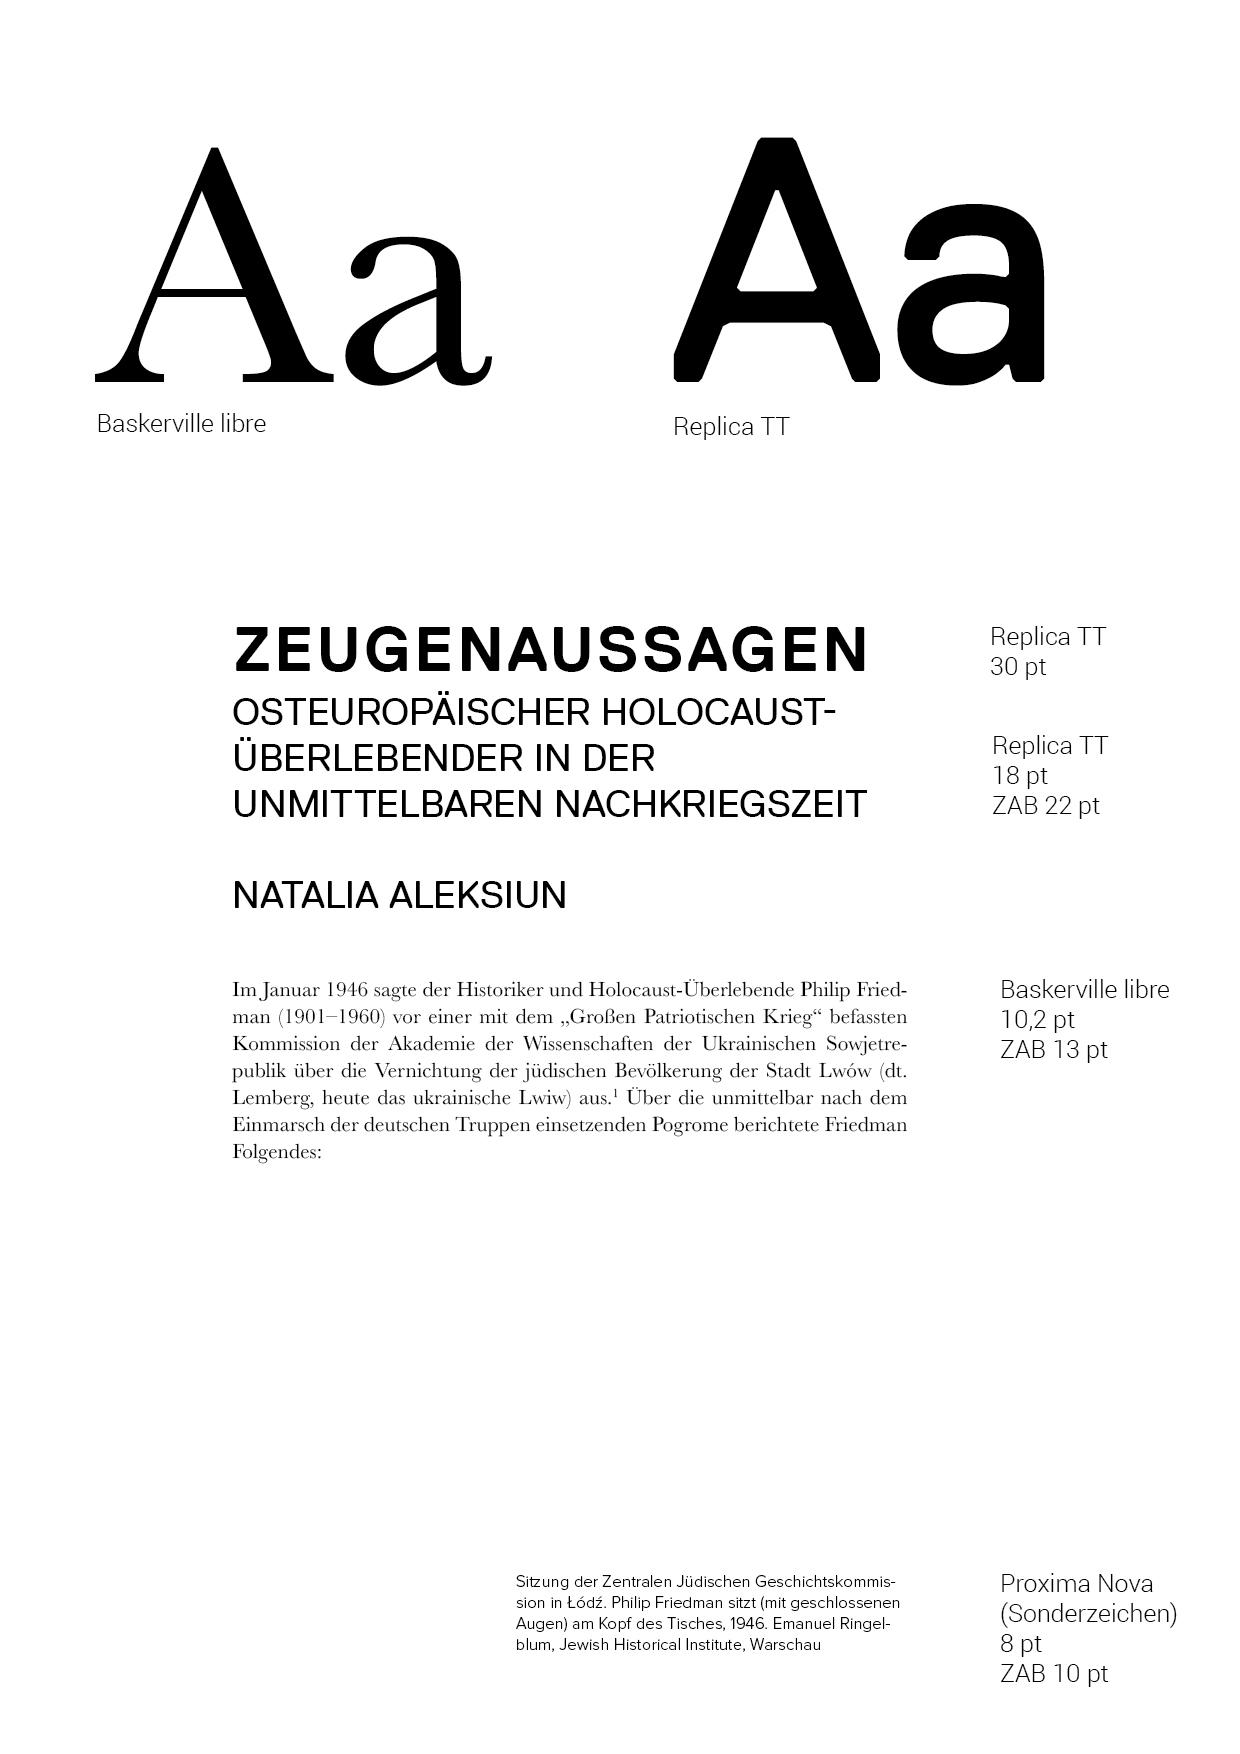 "<span class=""deutsch"">Schriftsheet</span><span class=""englisch"">typography sheet</span>"